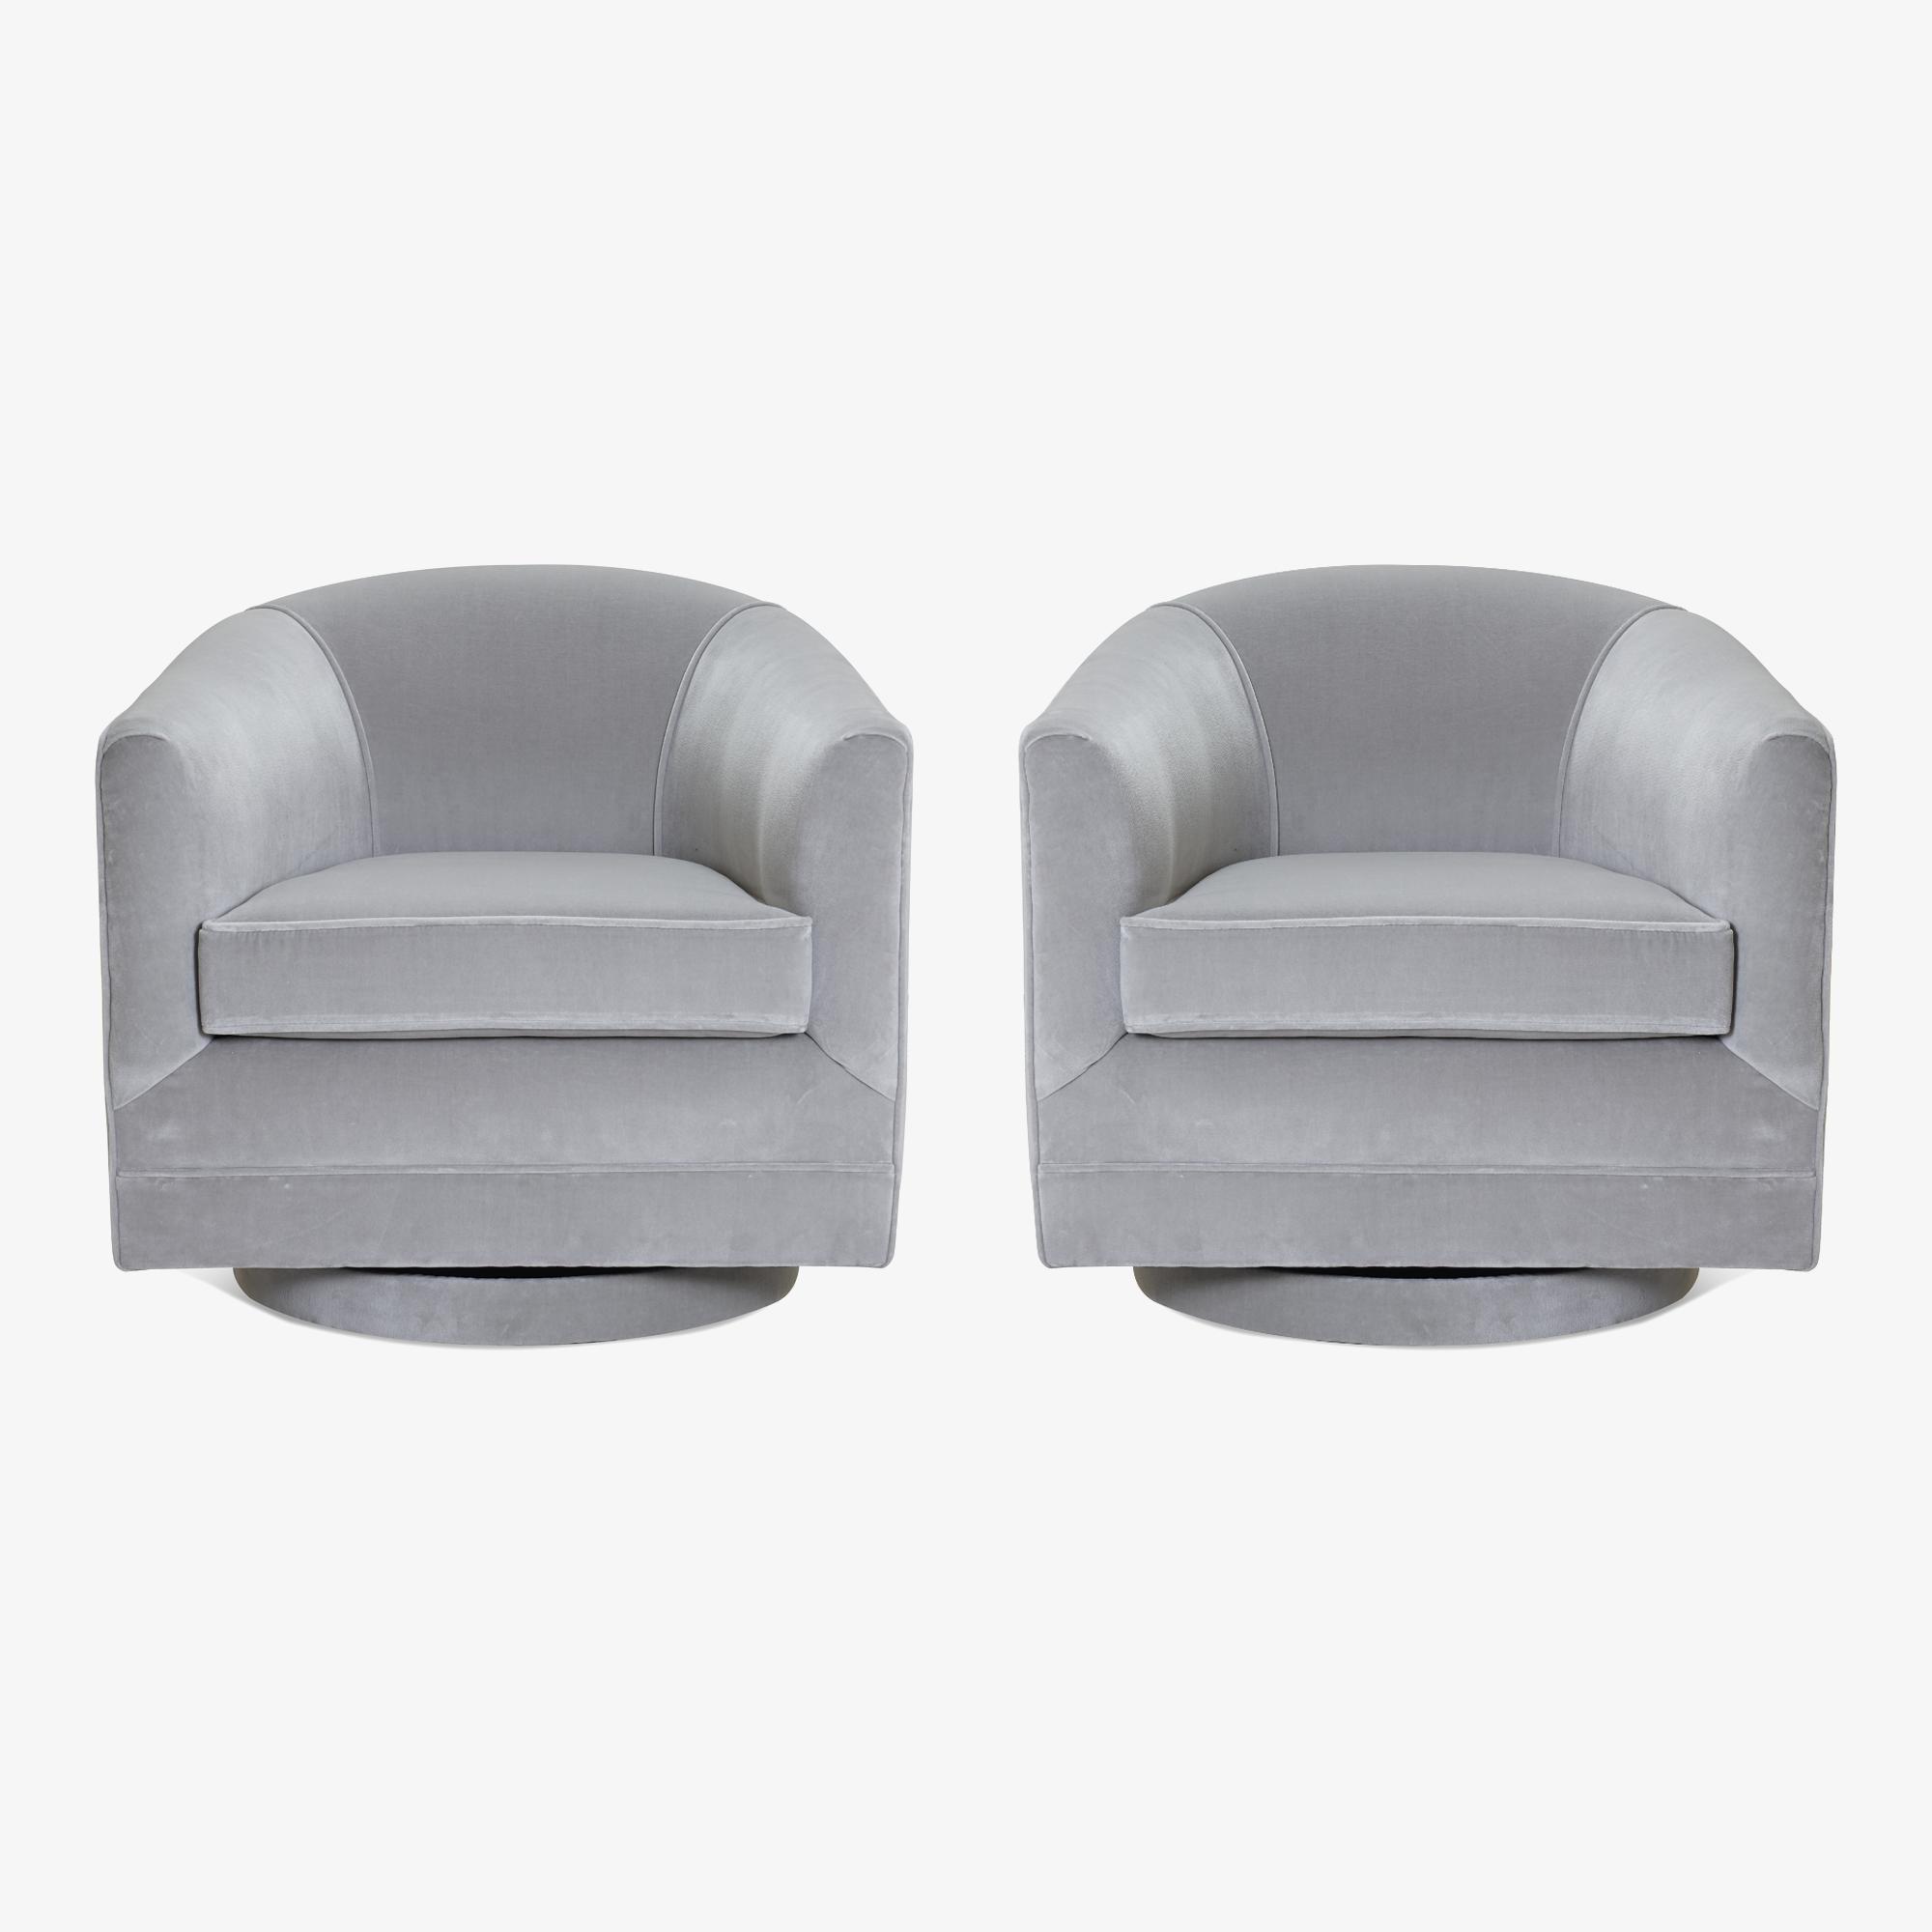 Swivel Tub Chairs in Dove Velvet, Pair2.png